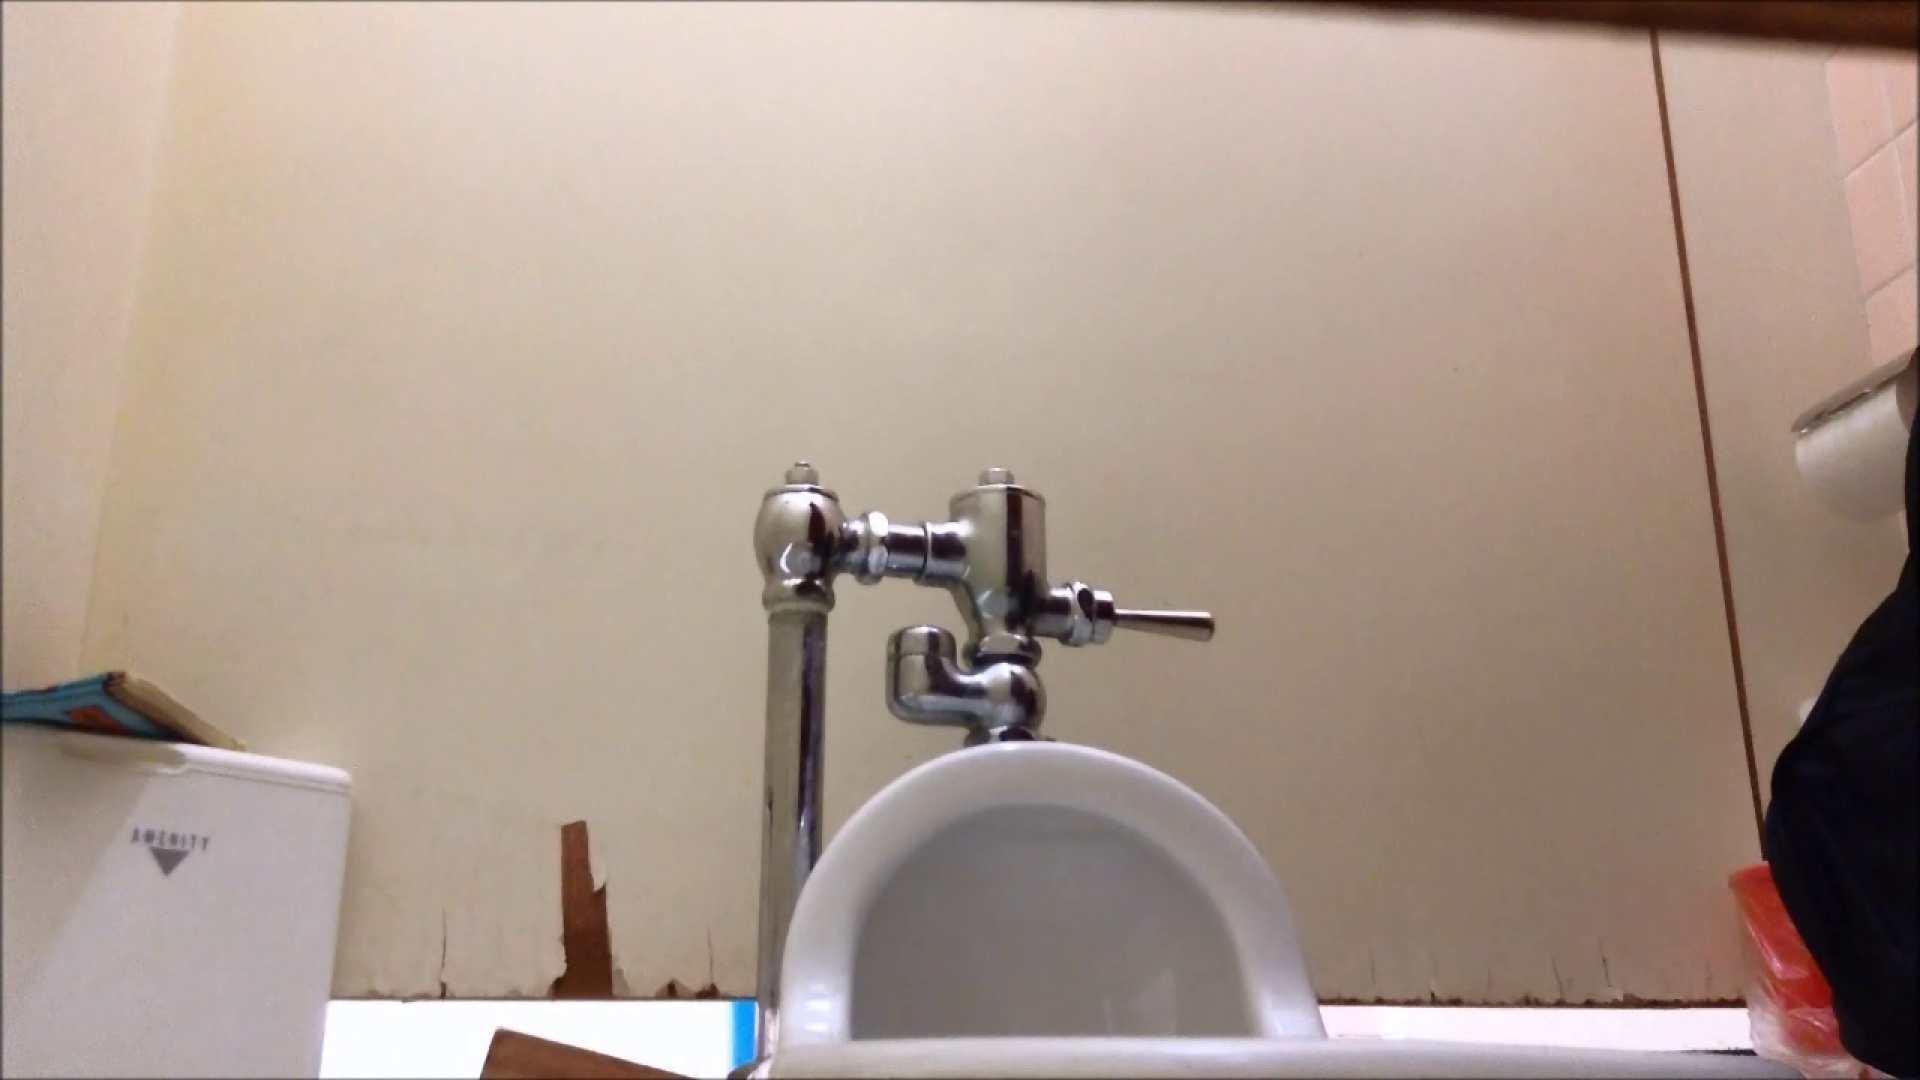 某有名大学女性洗面所 vol.06 和式 | 潜入 のぞき 80PIX 28